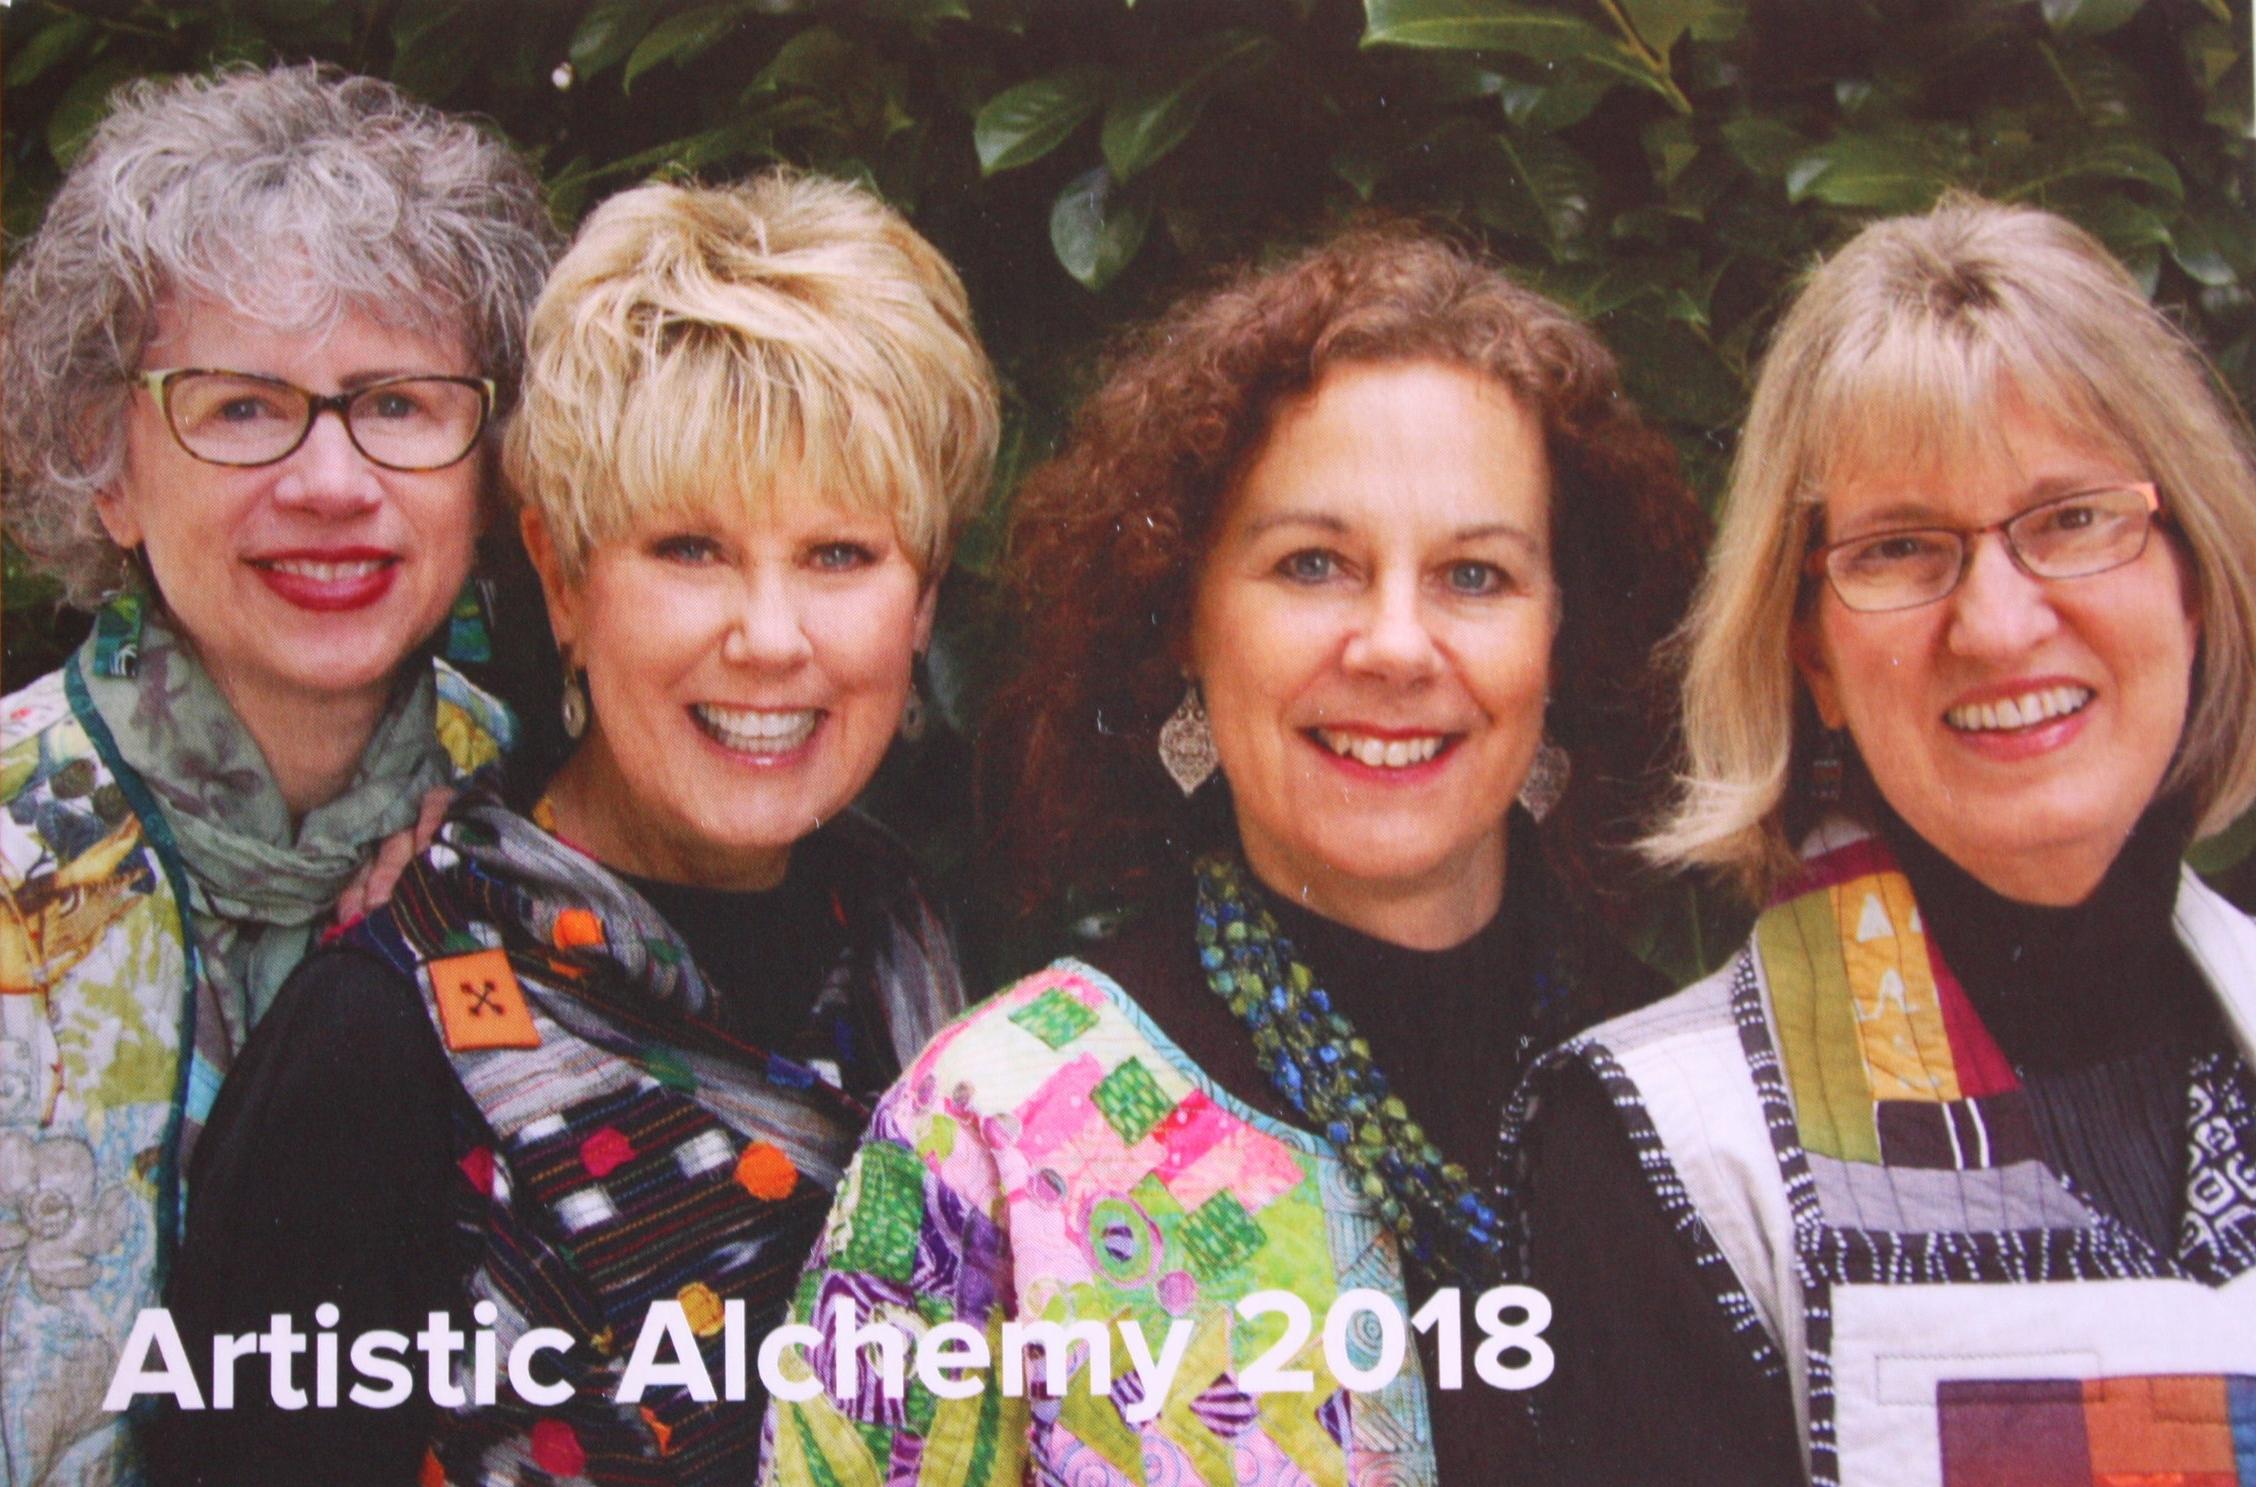 Artistic Alchemy 2018